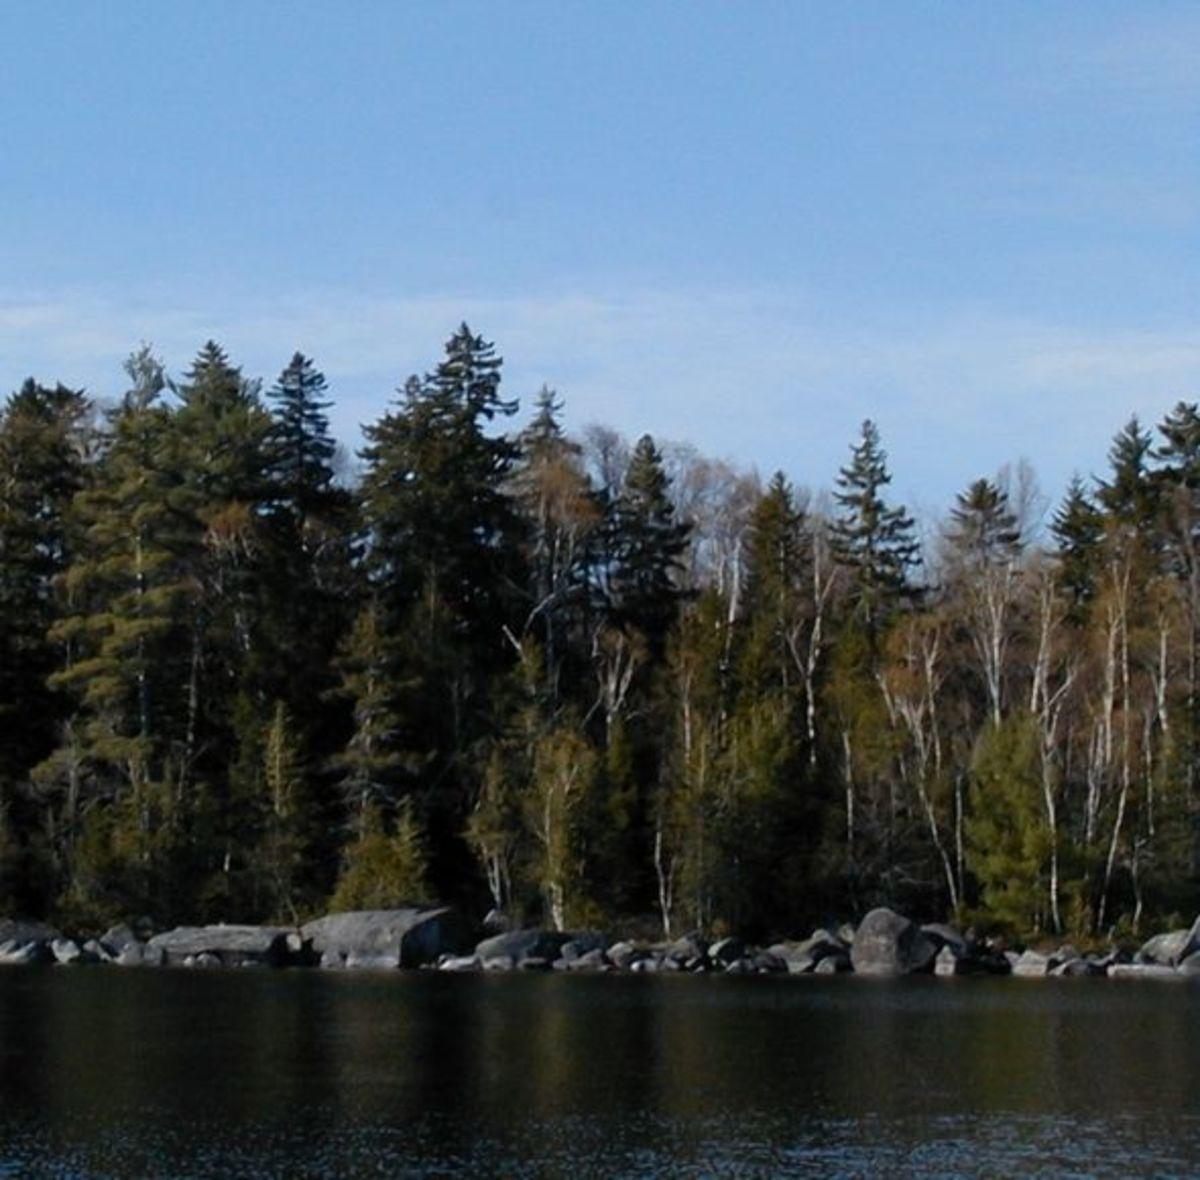 Spring Fishing In Maine: Trolling for Landlocked Salmon